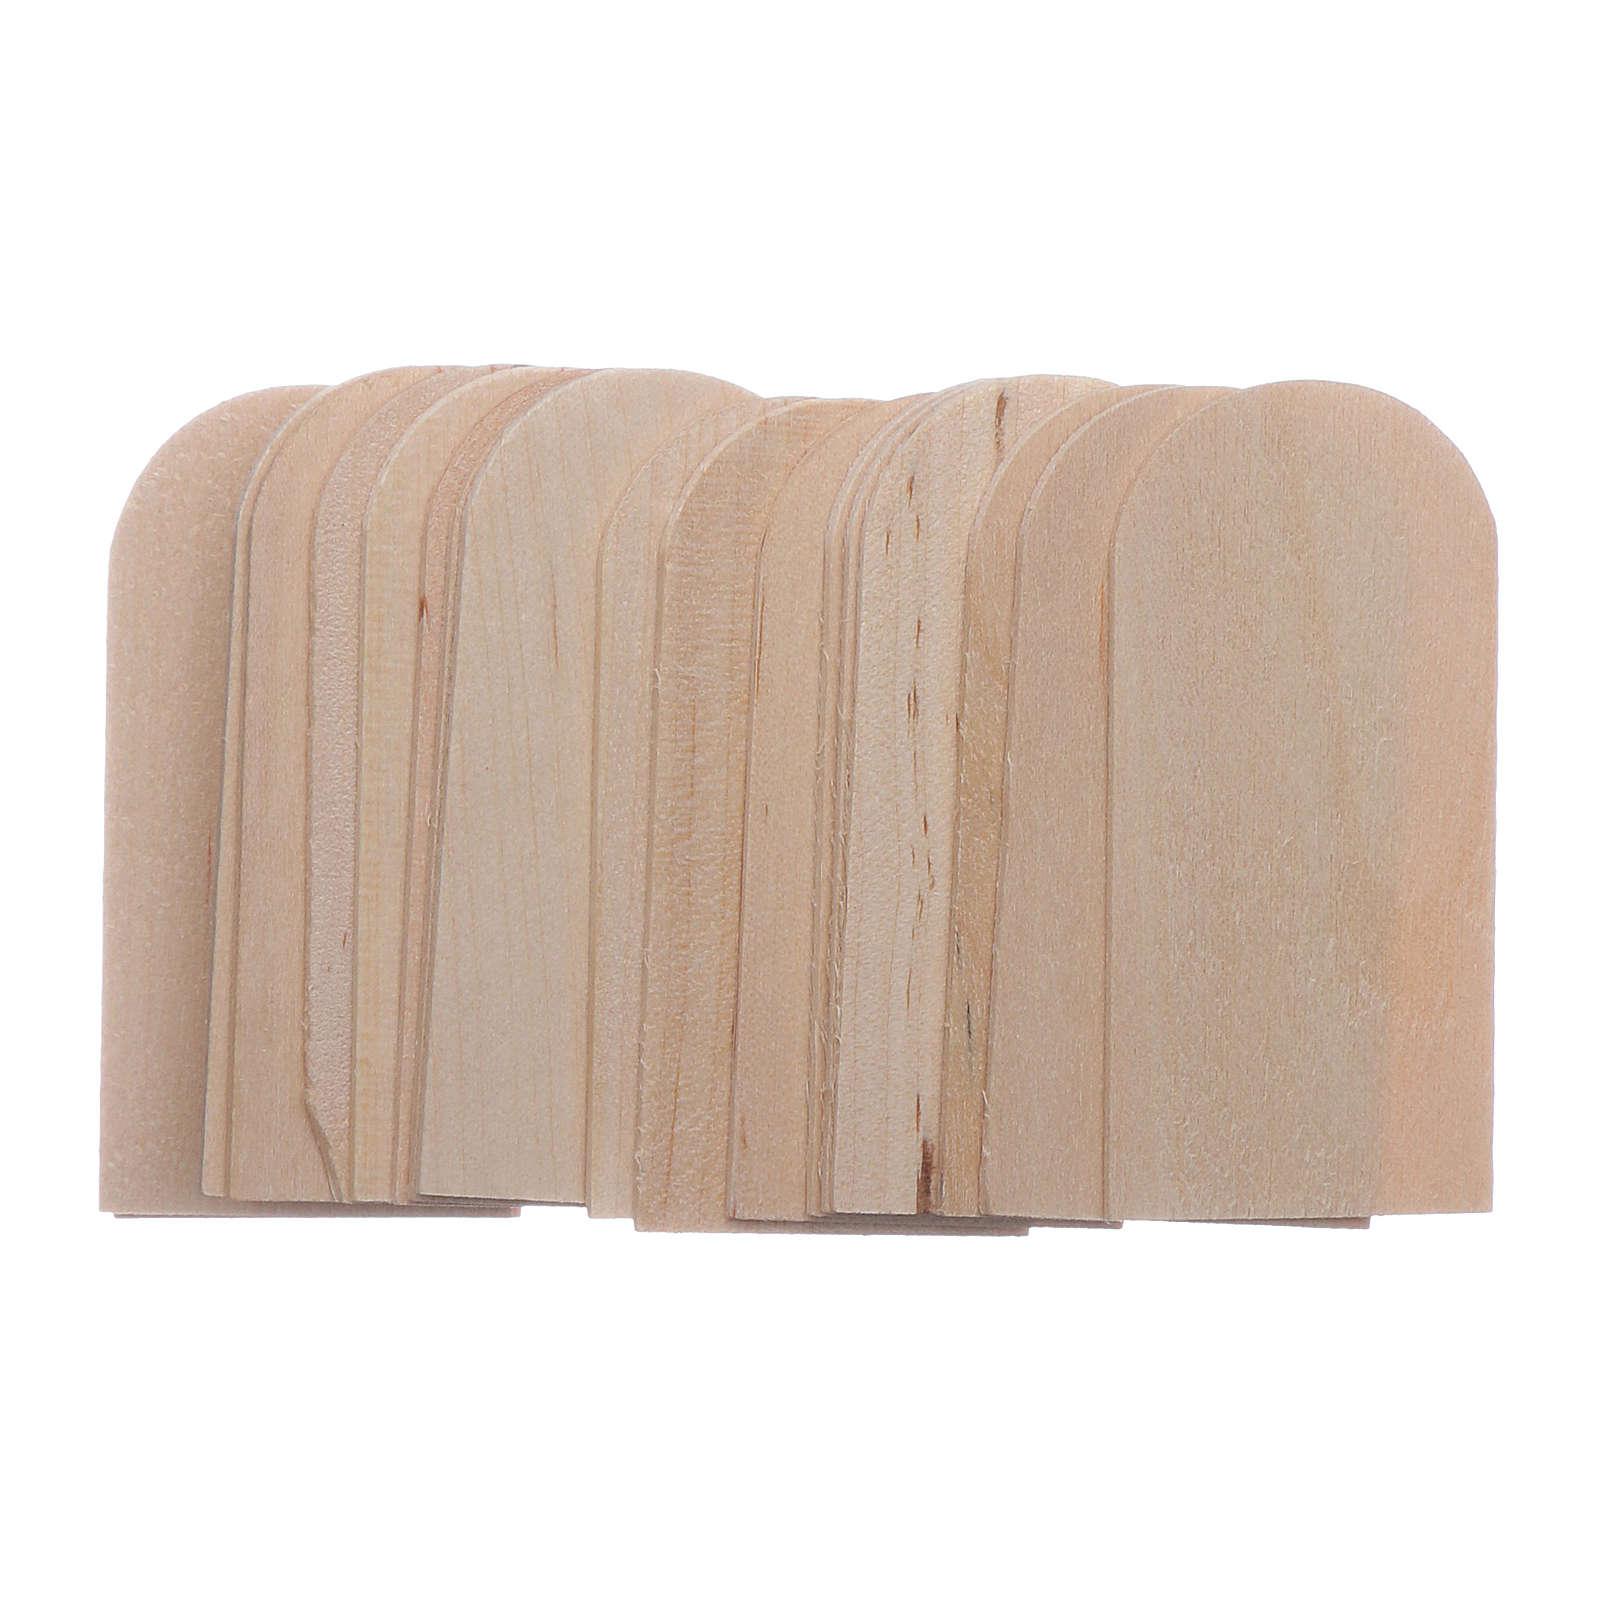 Scandole legno presepe 100 pz 2,5x5 cm 4